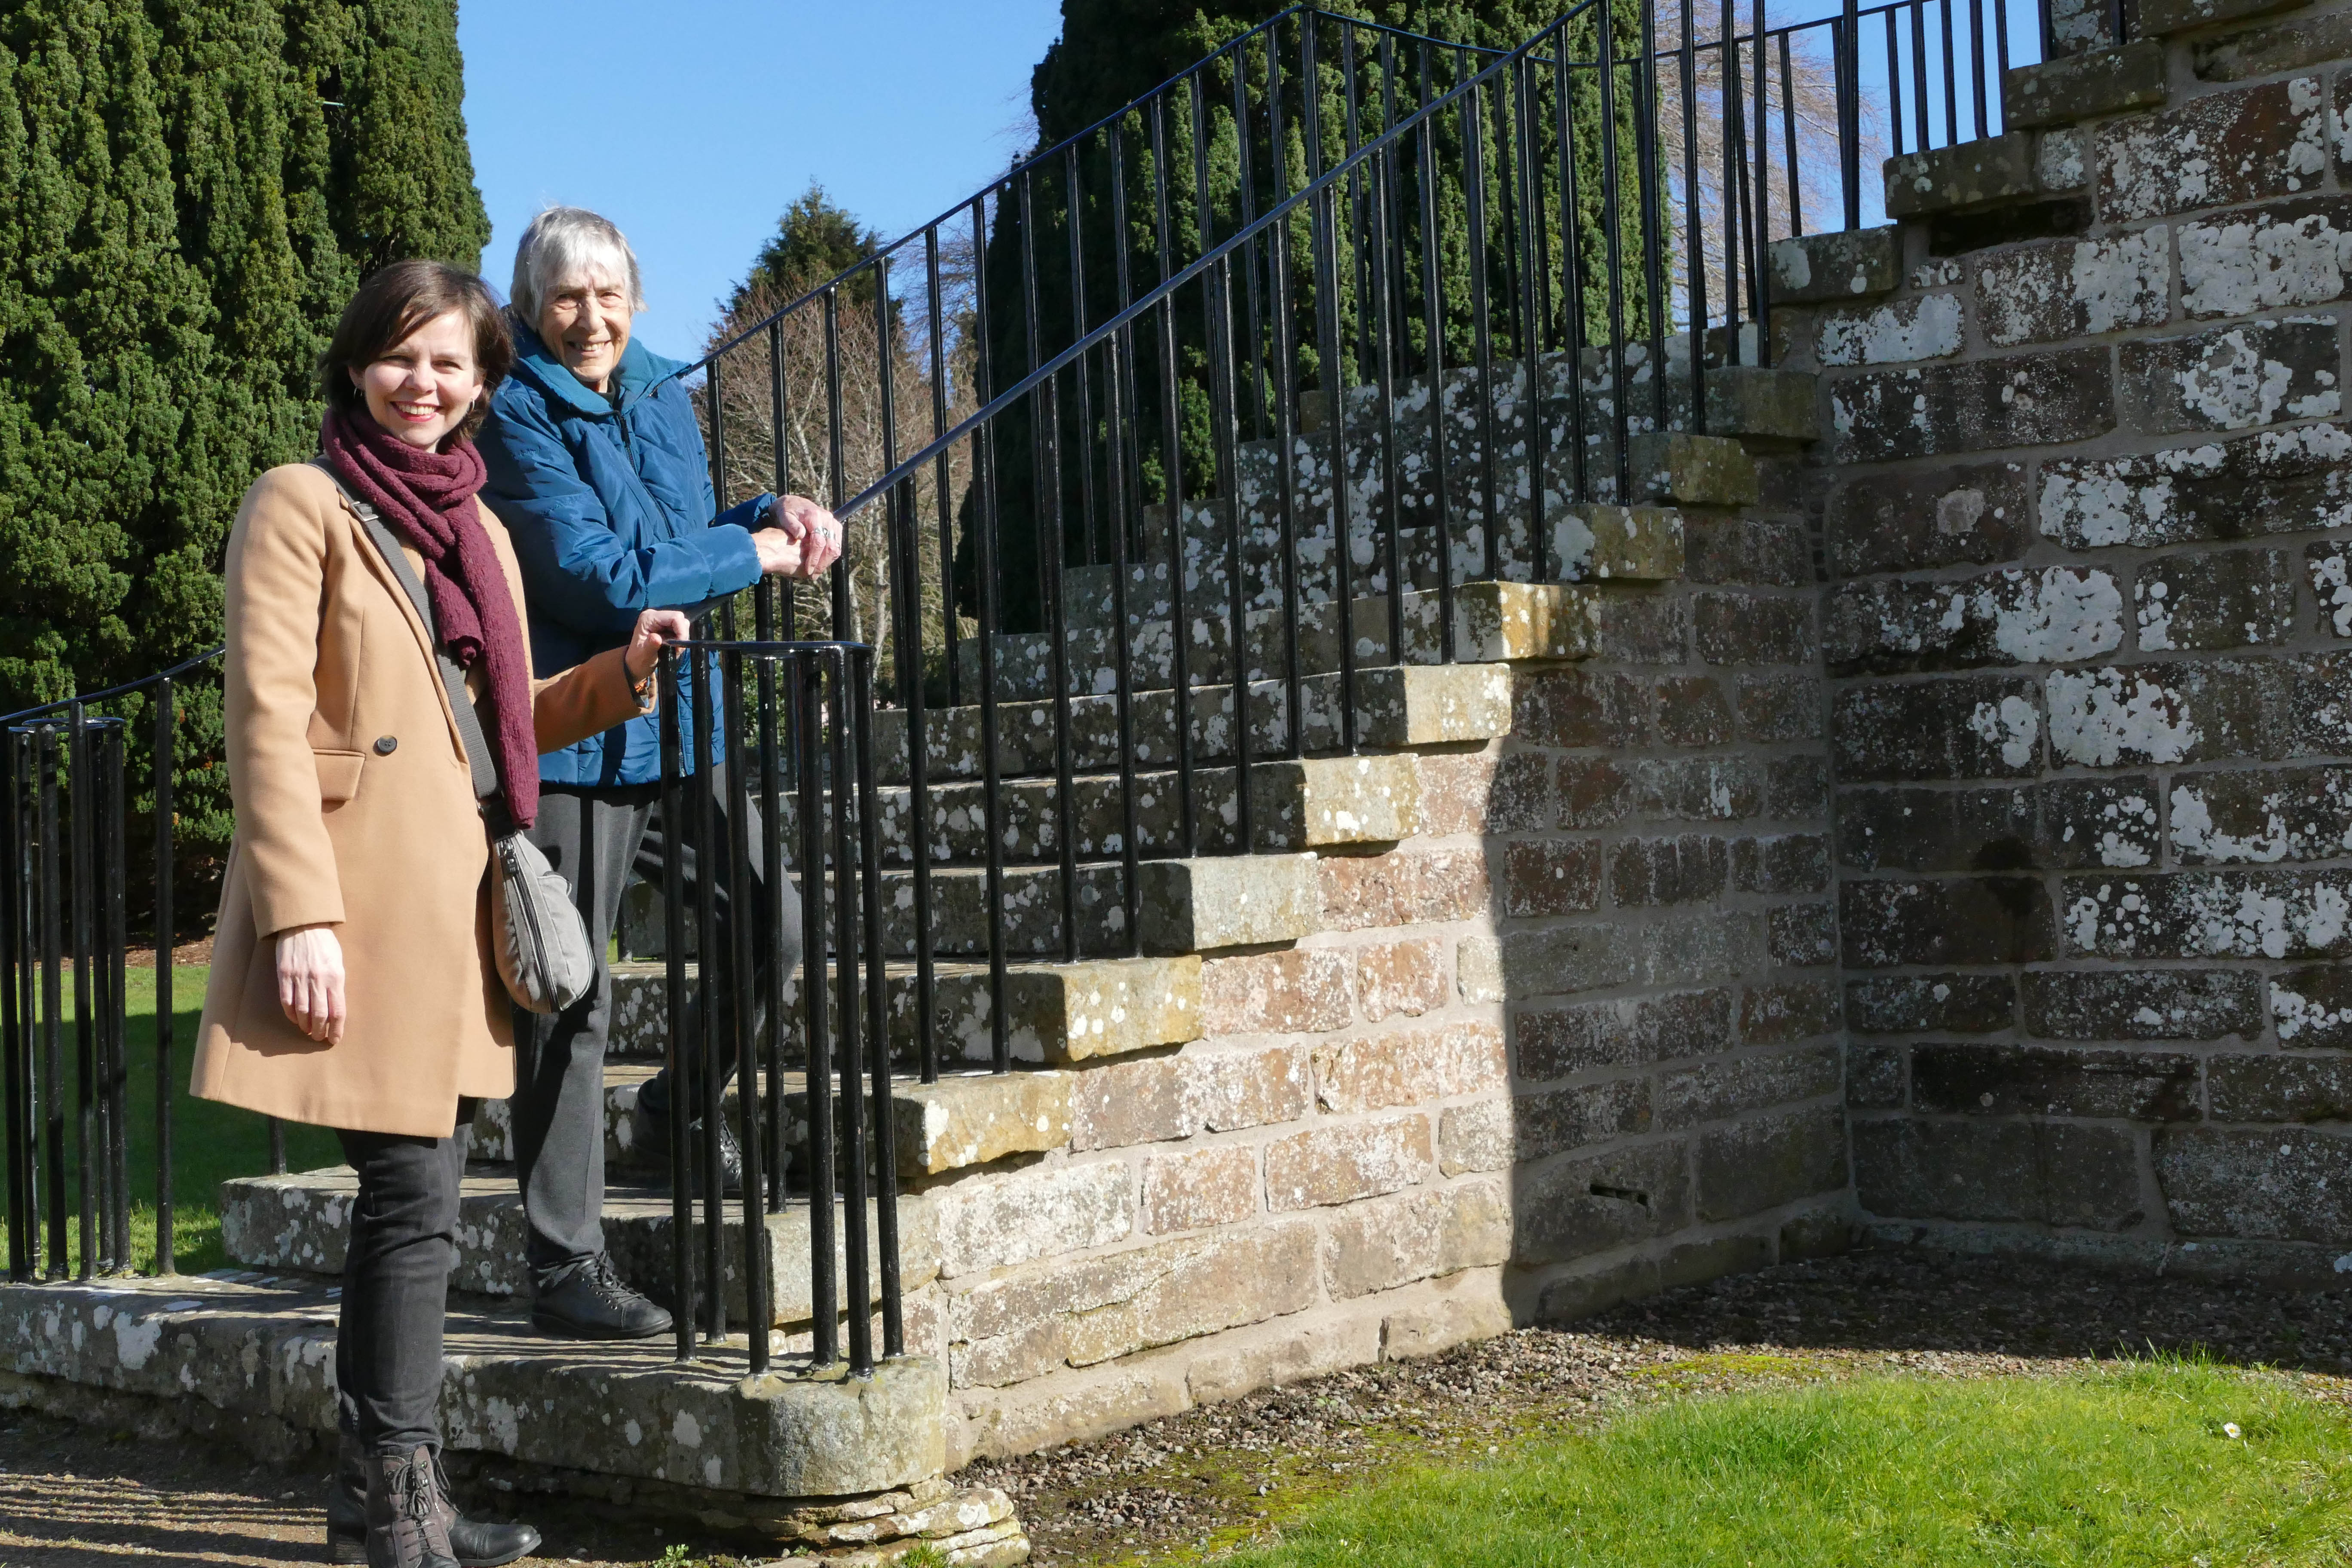 Author Elizabeth Sutherland with local artist Rachel Bevan Baker